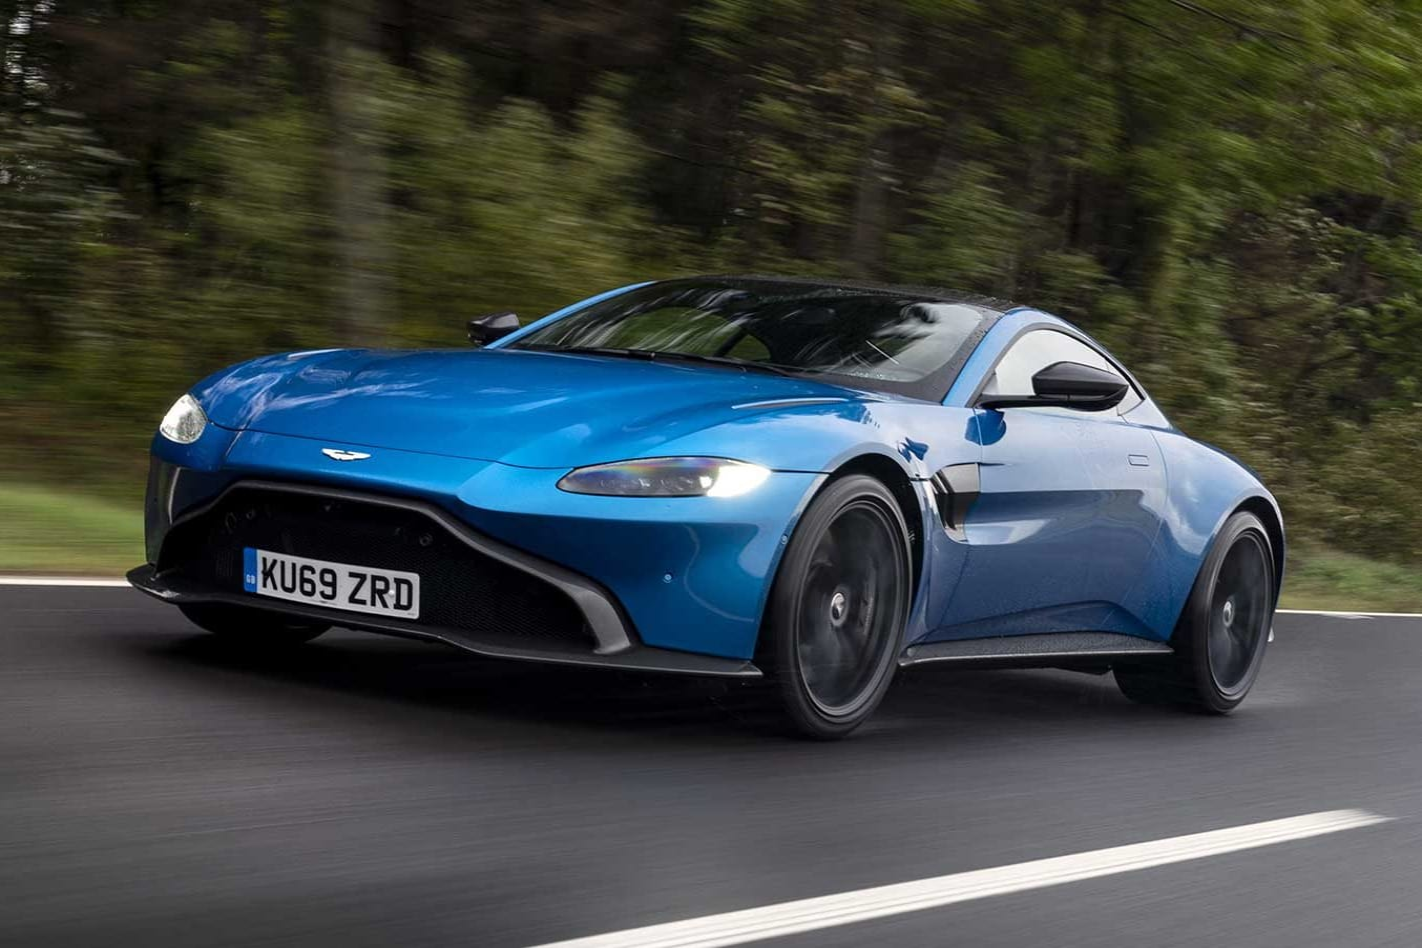 Aston Martin Vantage manual review